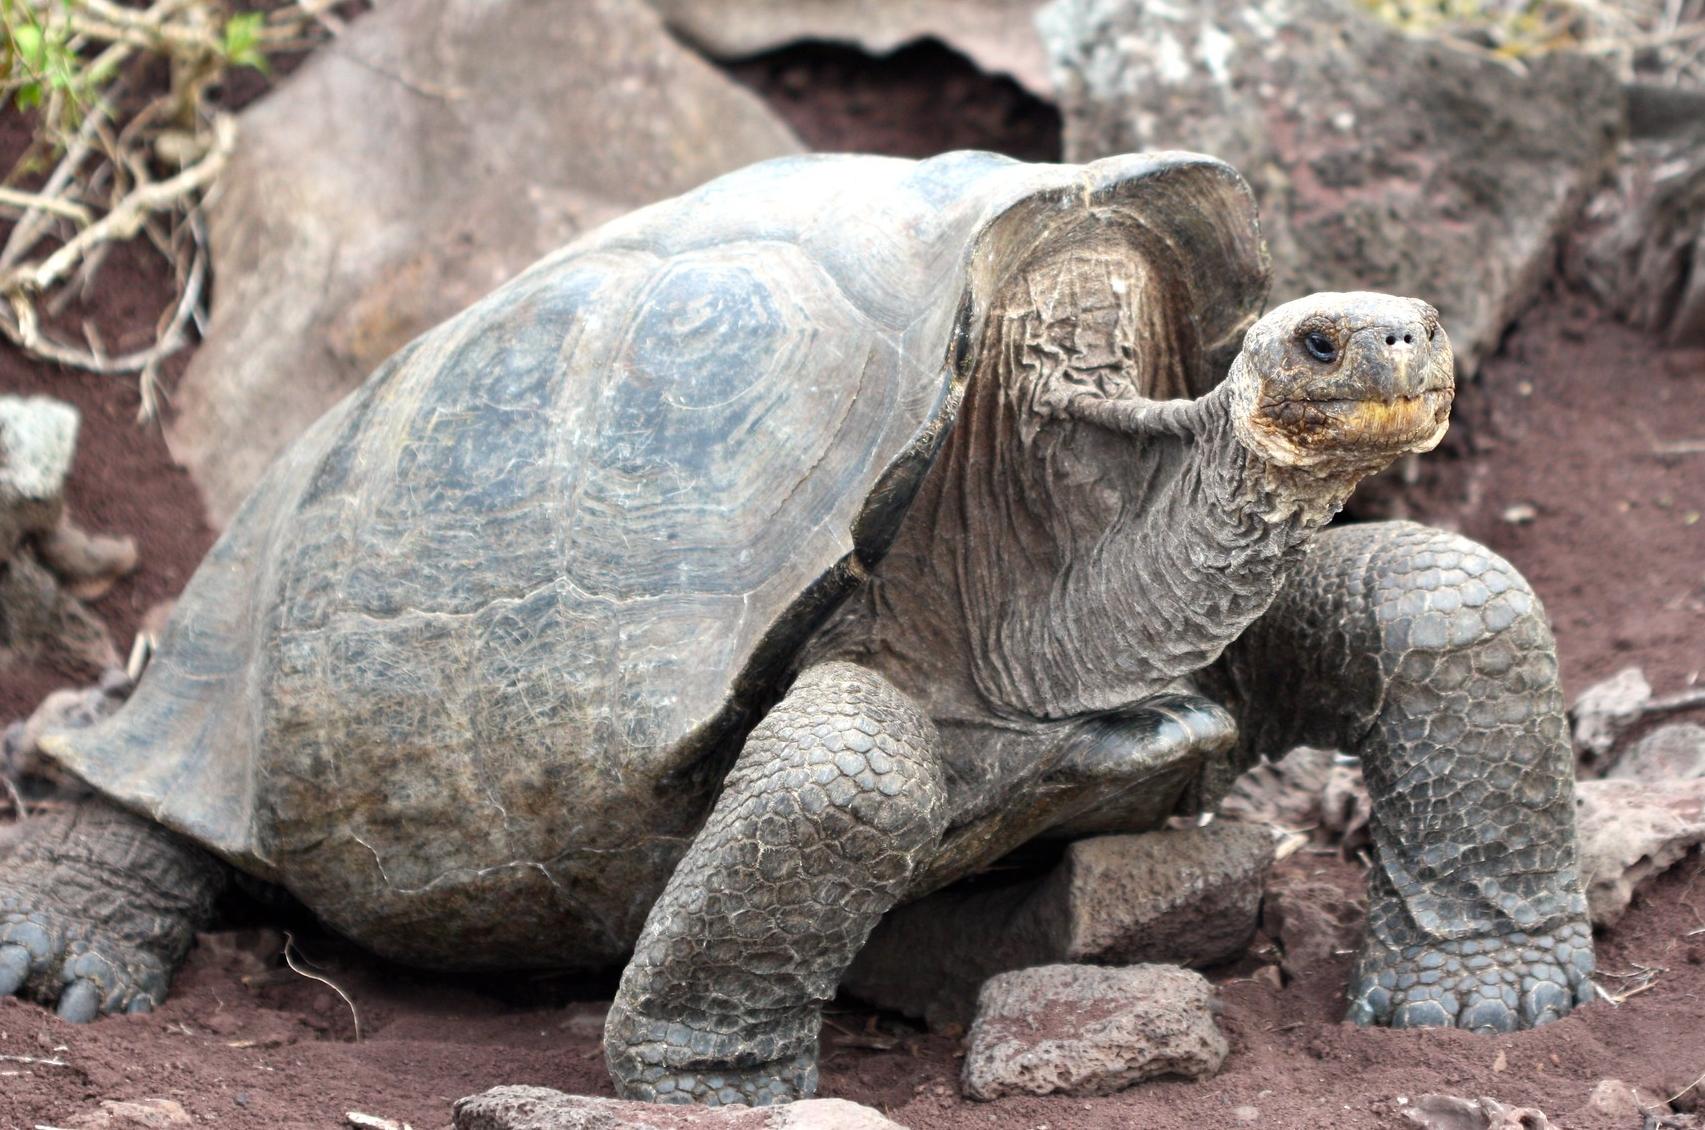 saddleback-shell-giant-tortoise-Galápagos-carapace-form